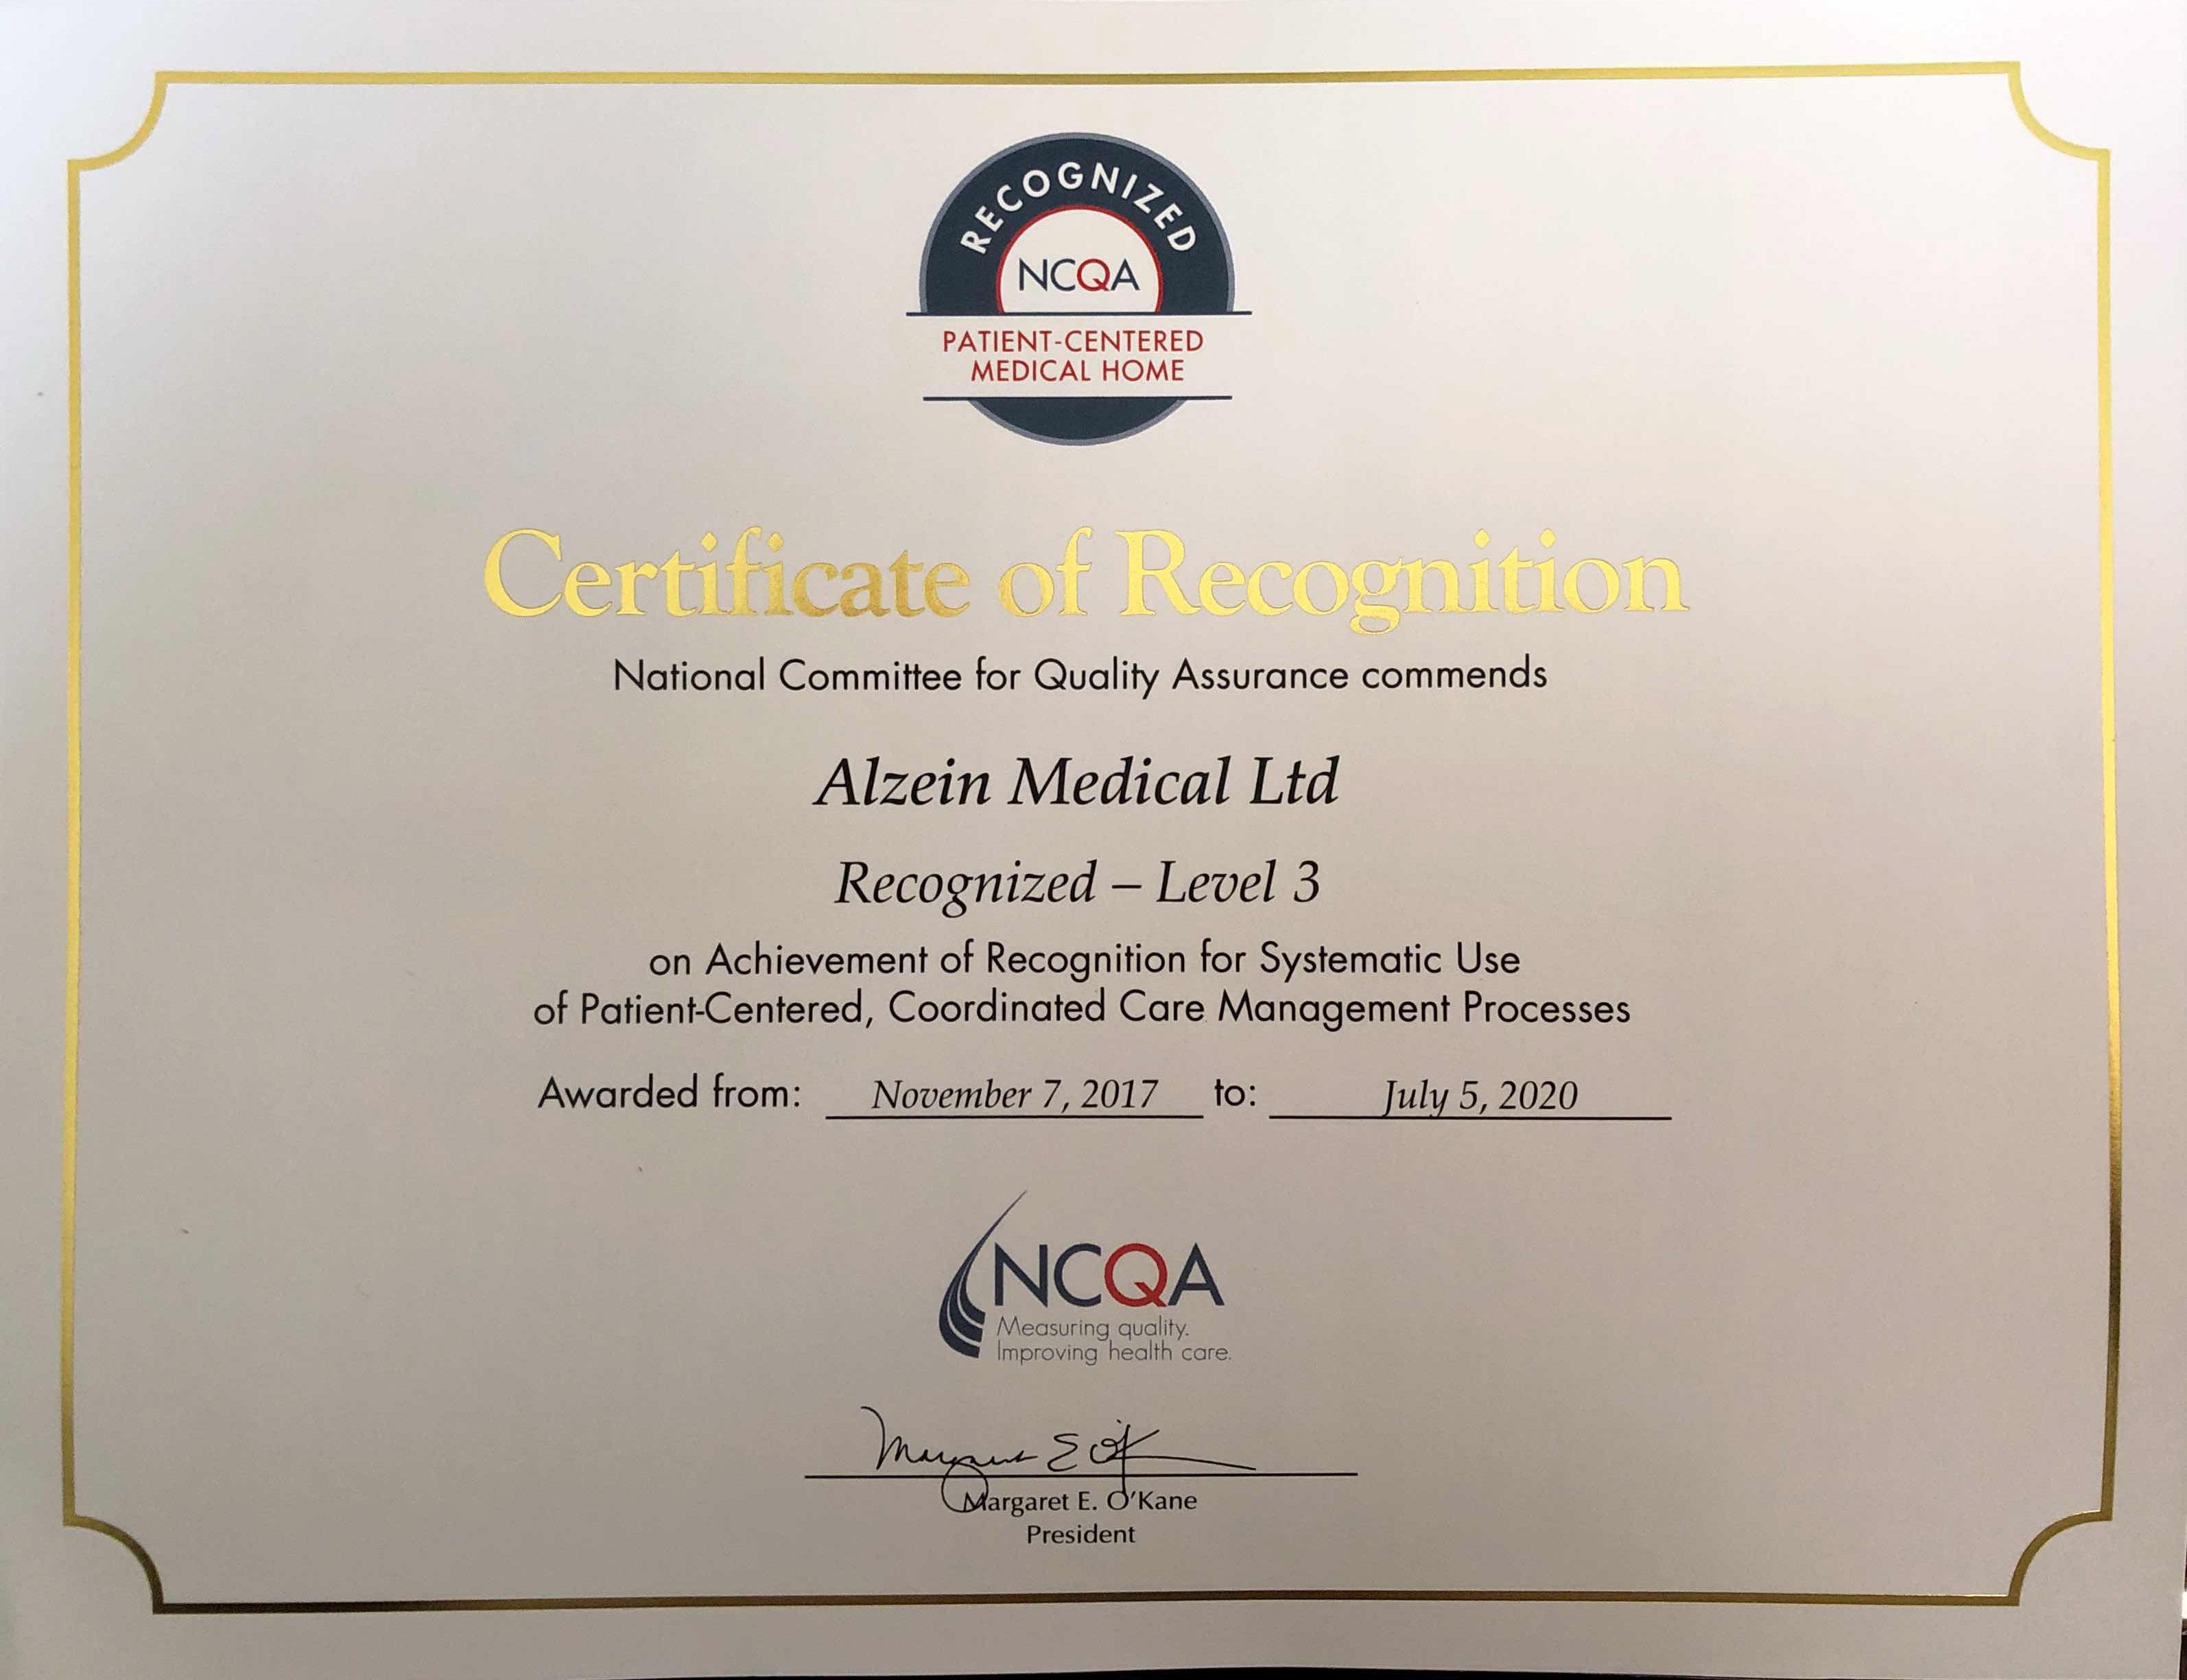 Best Pediatrician In Oak Lawn Il 60453 Evergreen Park Il 60805